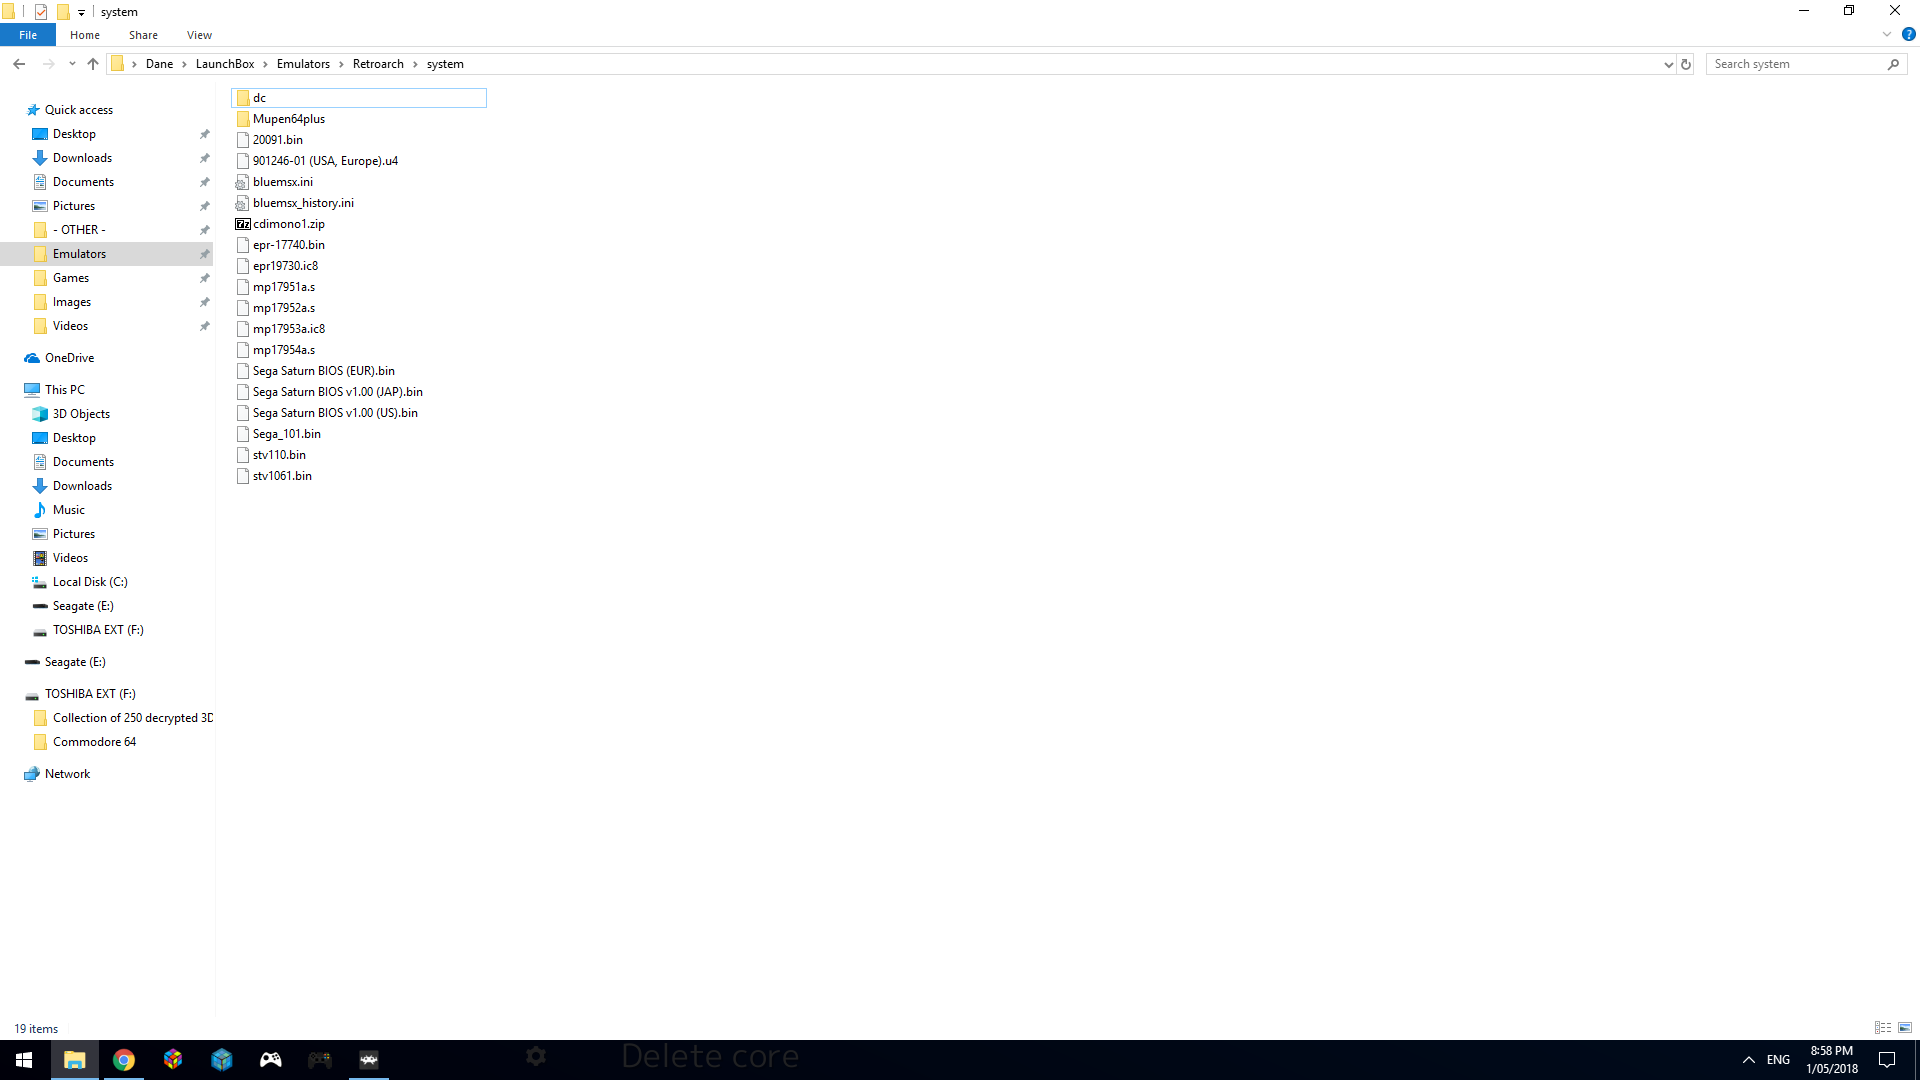 SEGA Saturn stuck on system settings menu in Mednafen - Emulation